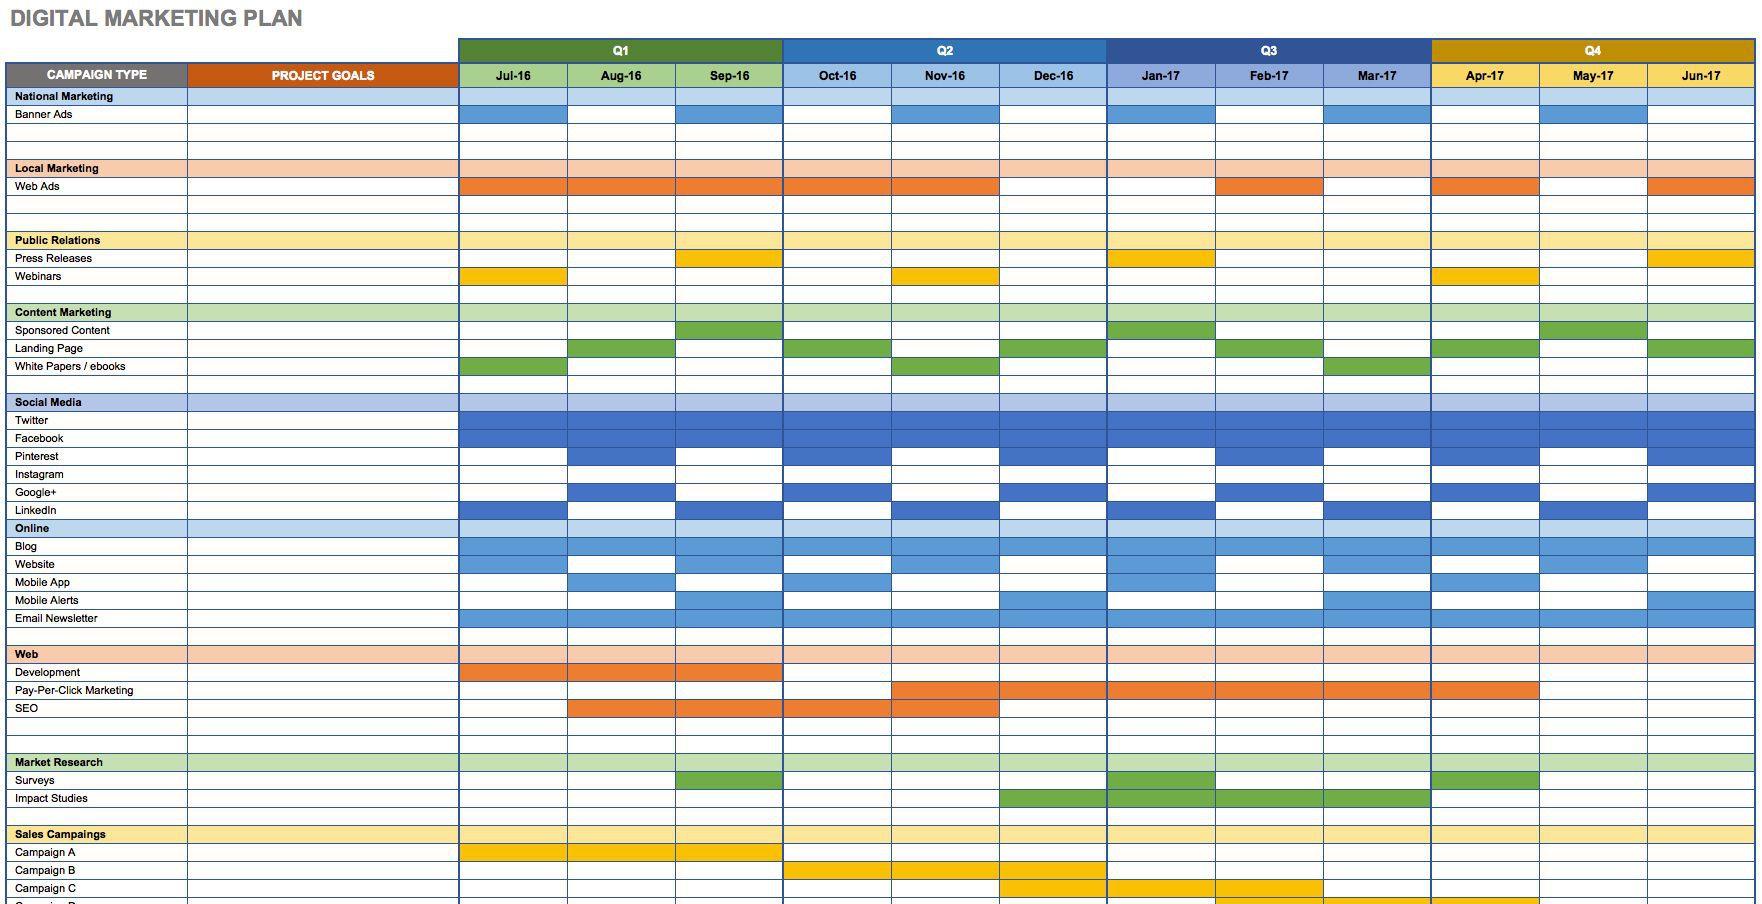 004 Fantastic Digital Marketing Busines Plan Example High Resolution  Template Free Sample PdfFull